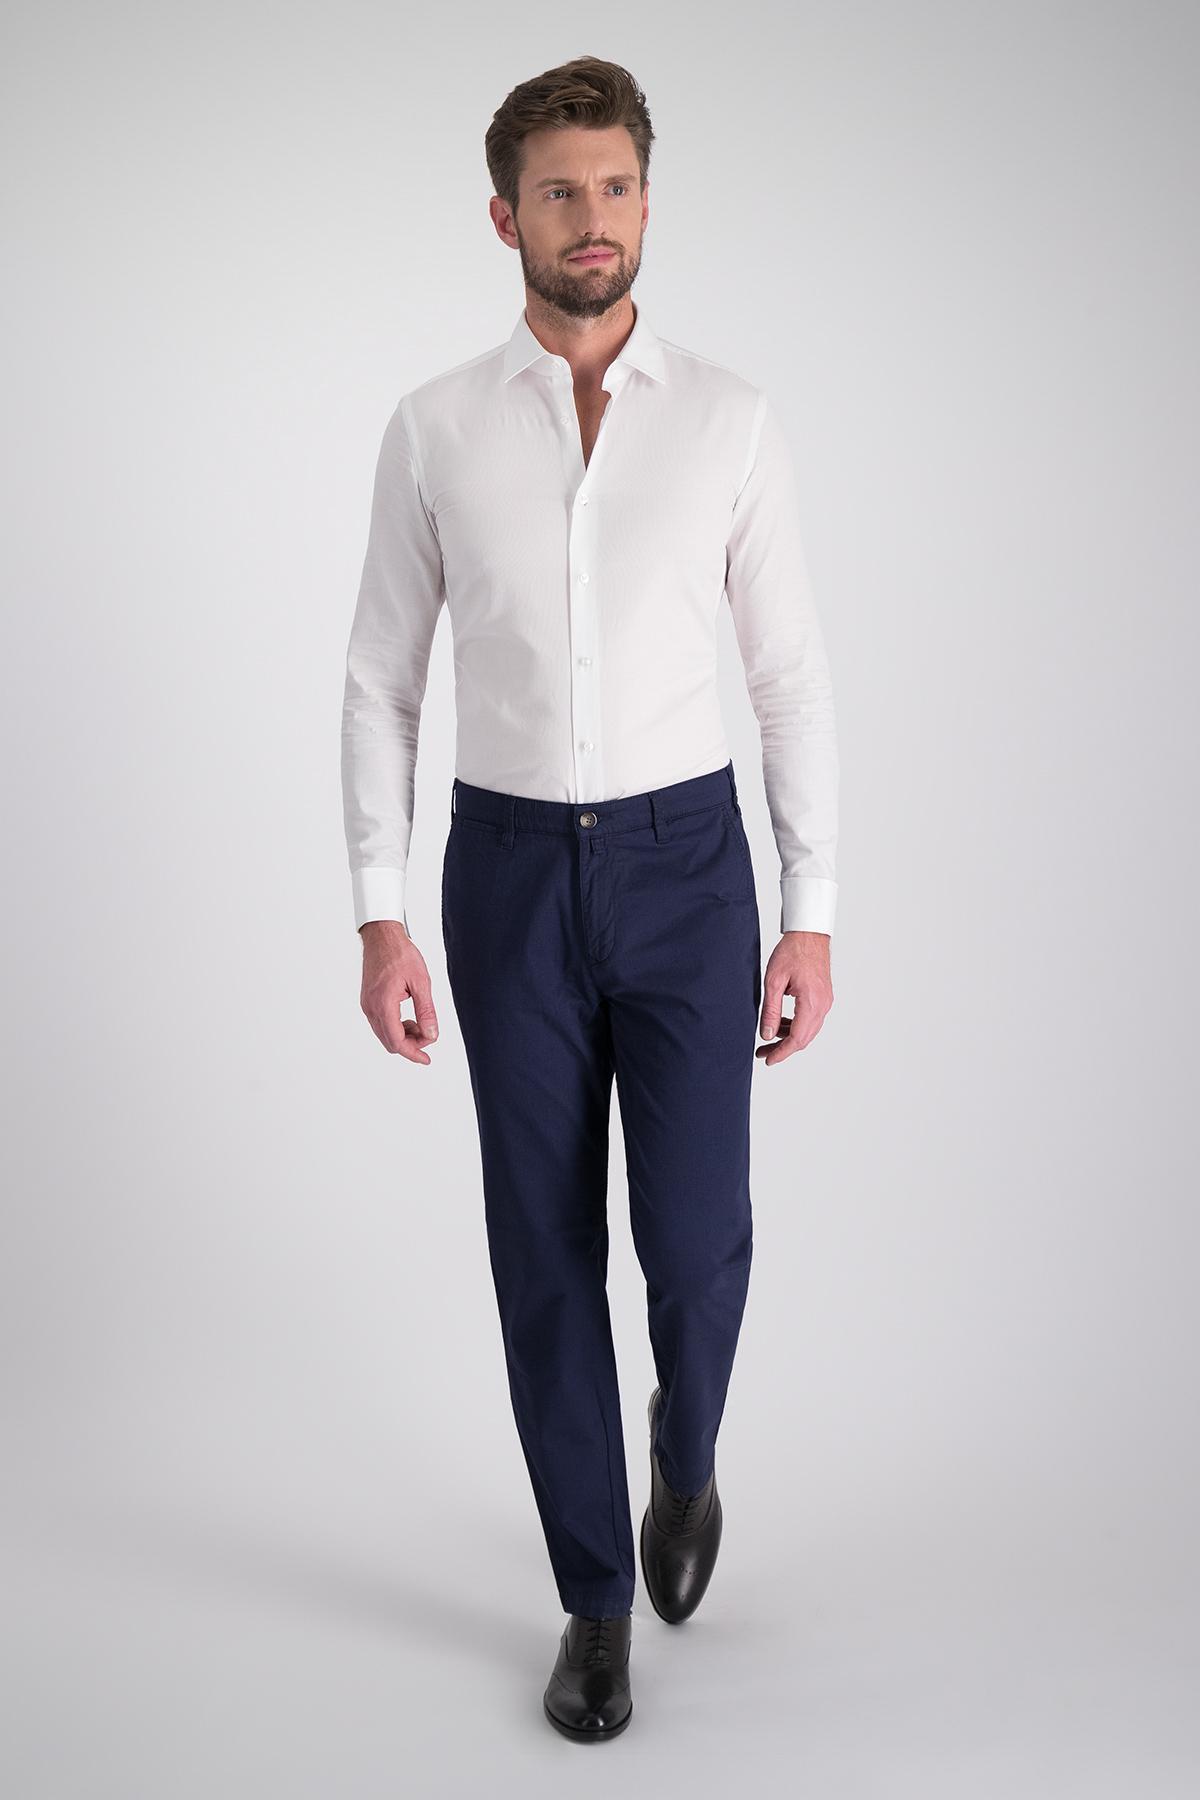 Pantalon Sport Calderoni tipo chino azul medio